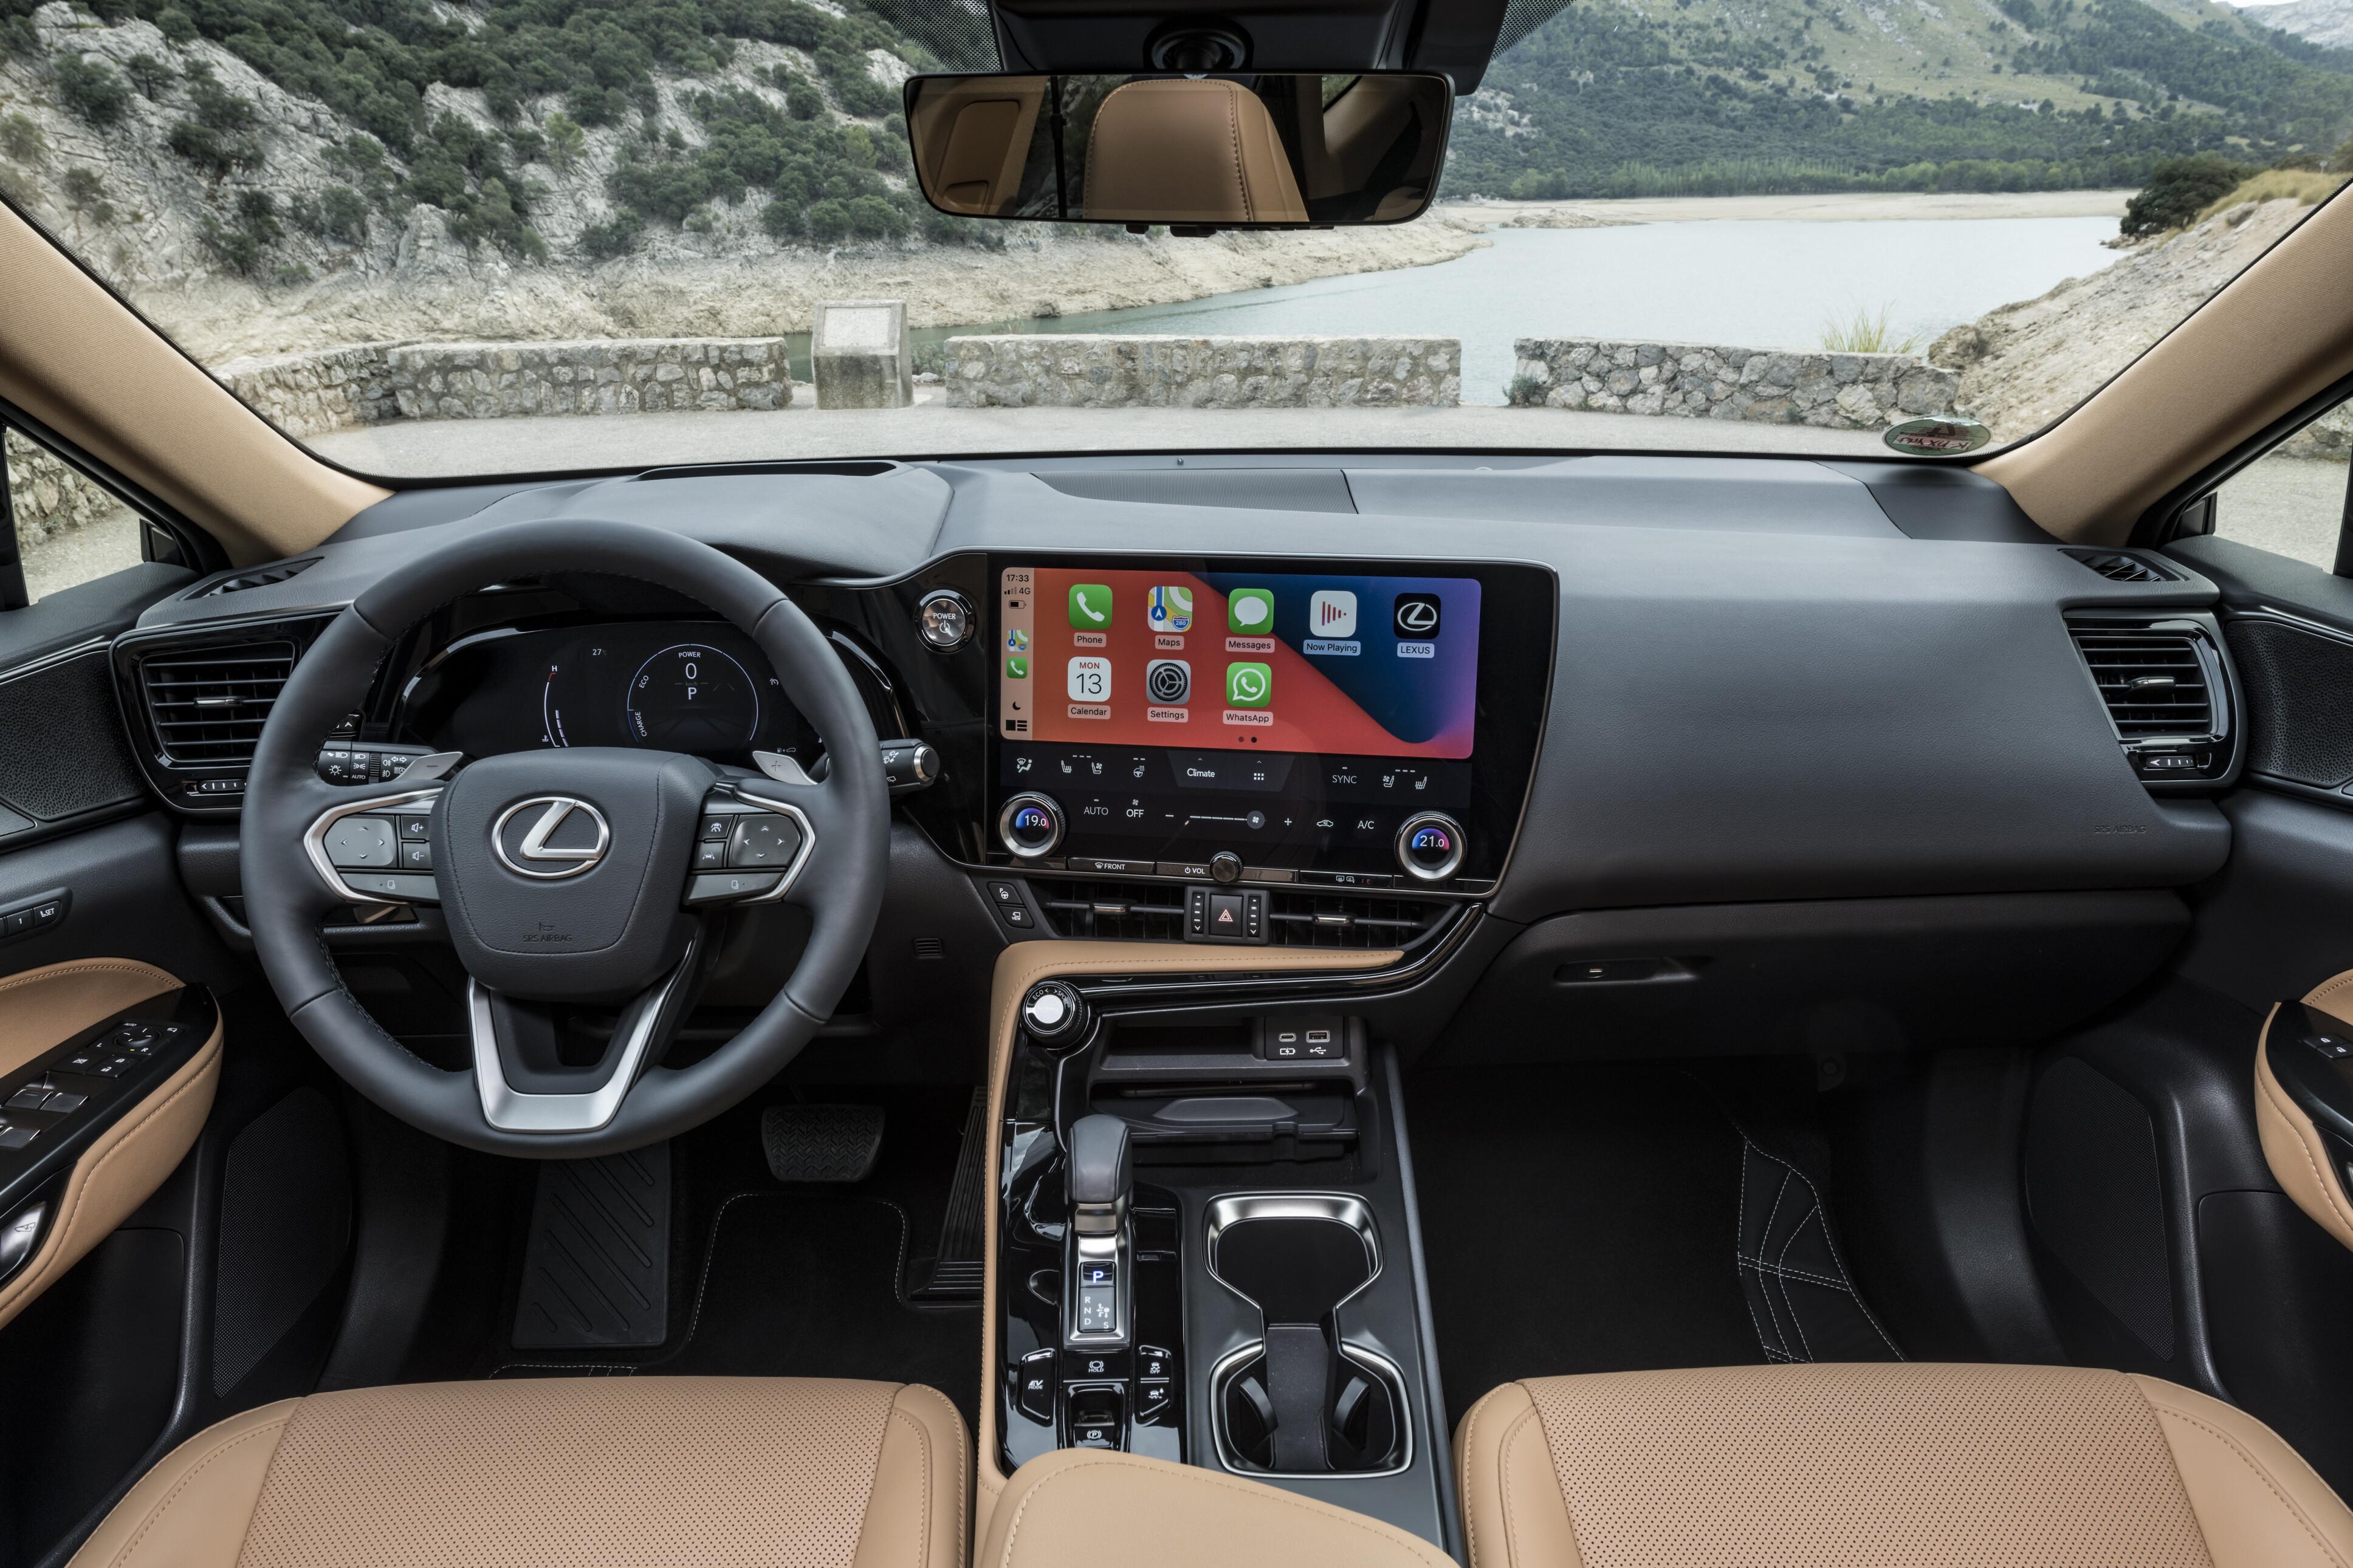 Lexus Nx 350 H 2022 Lexus Nx 350 H review 31